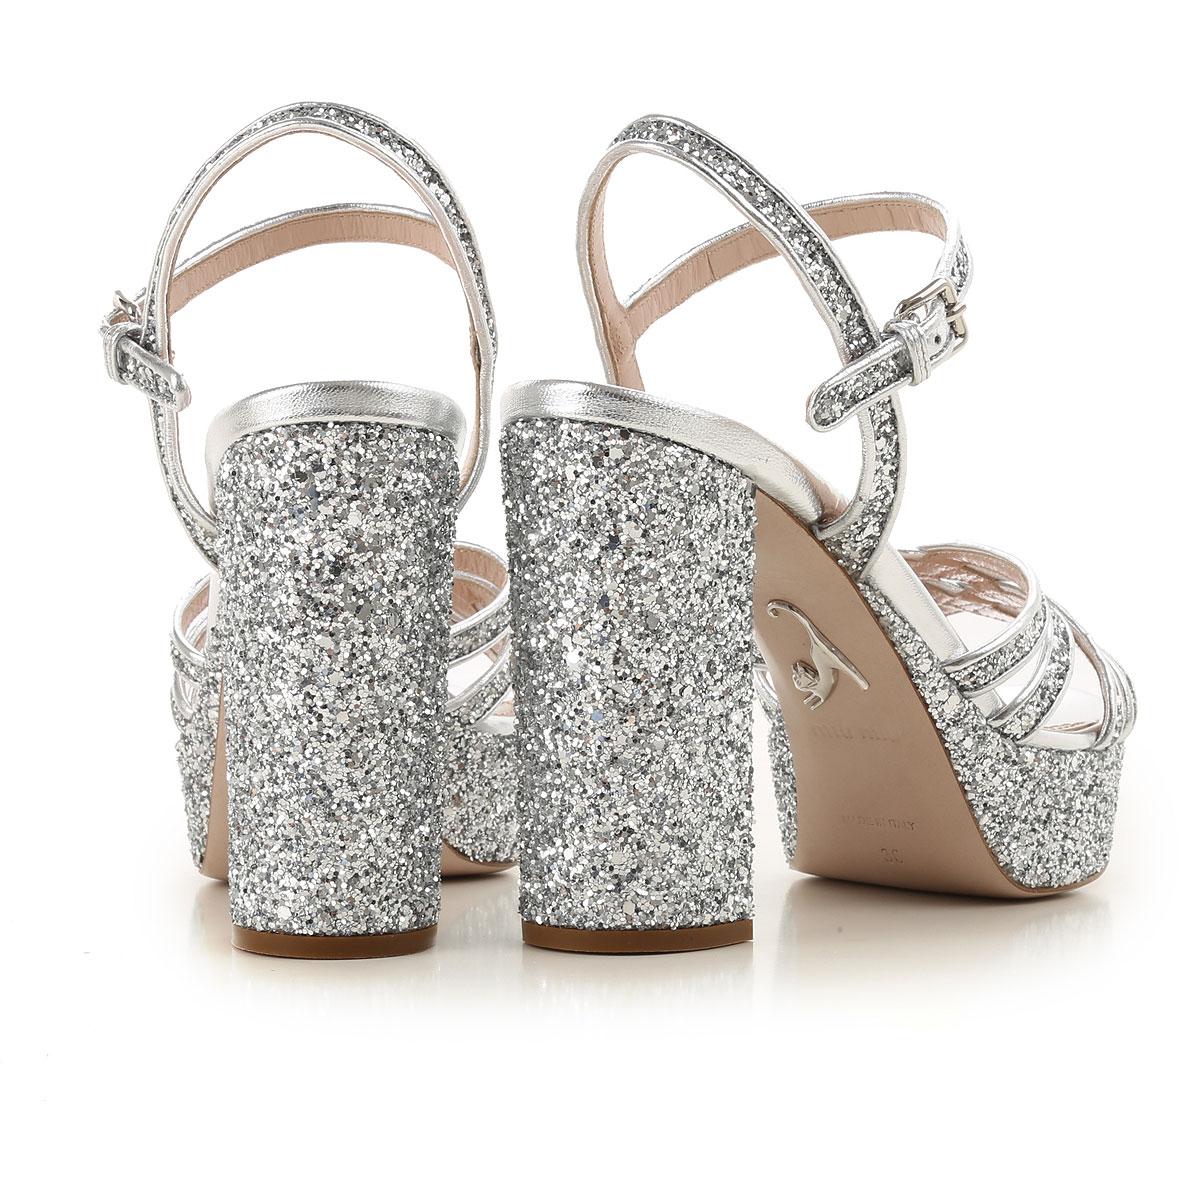 Primavera Plata Para Mujer verano Miu 2019 nbsp; Zapatos YxCqg48wt